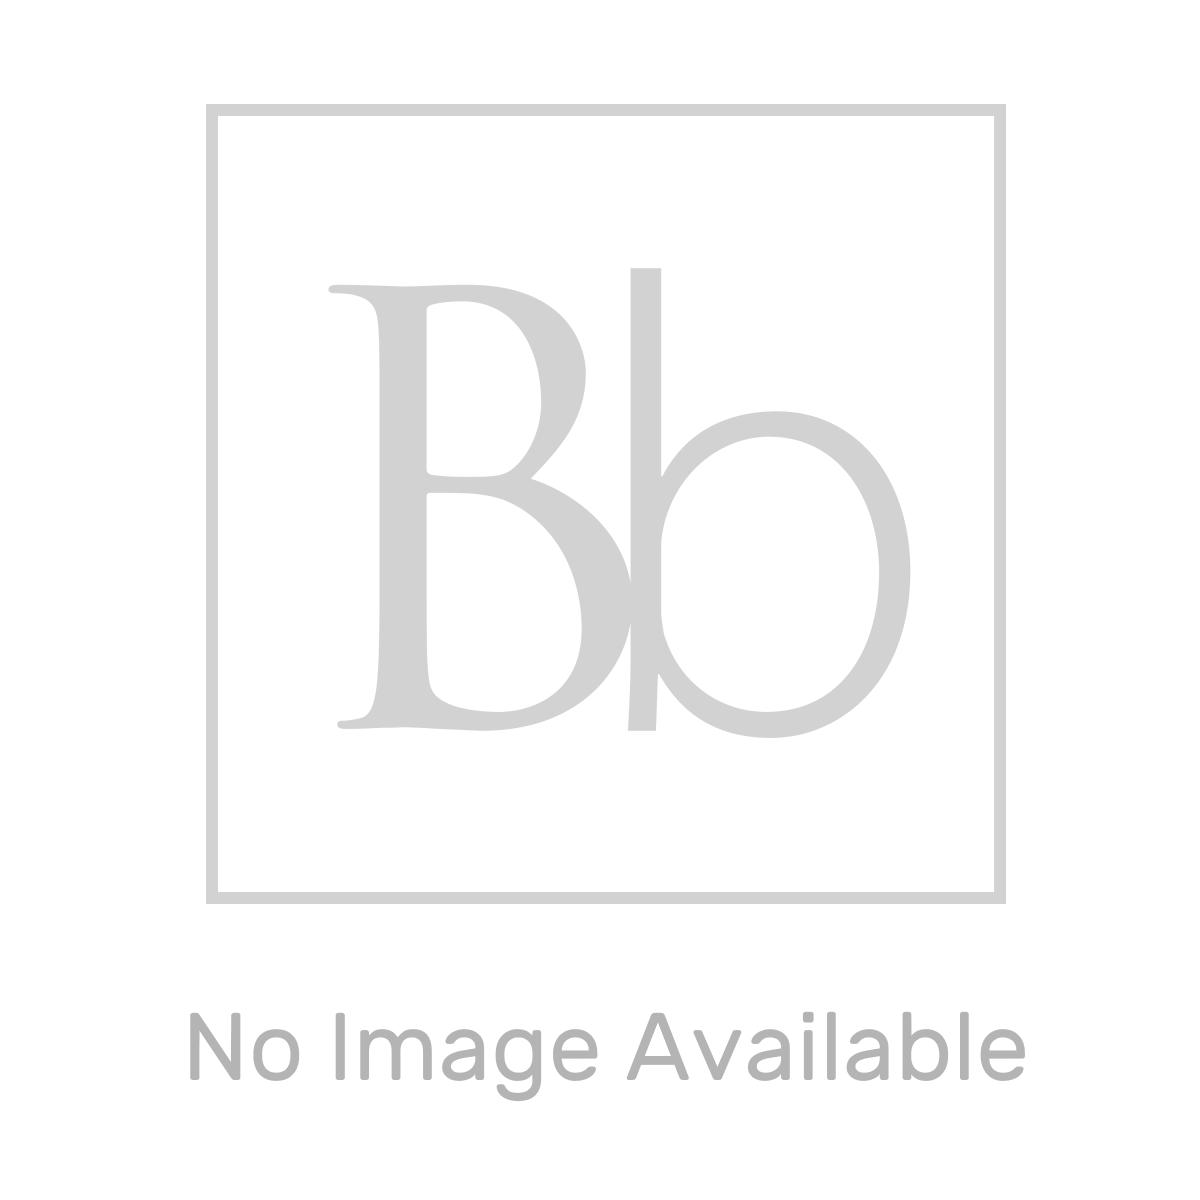 Nuie Athena Natural Oak 2 Door Floor Standing Vanity Unit with 50mm Profile Basin 500mm Line Drawing